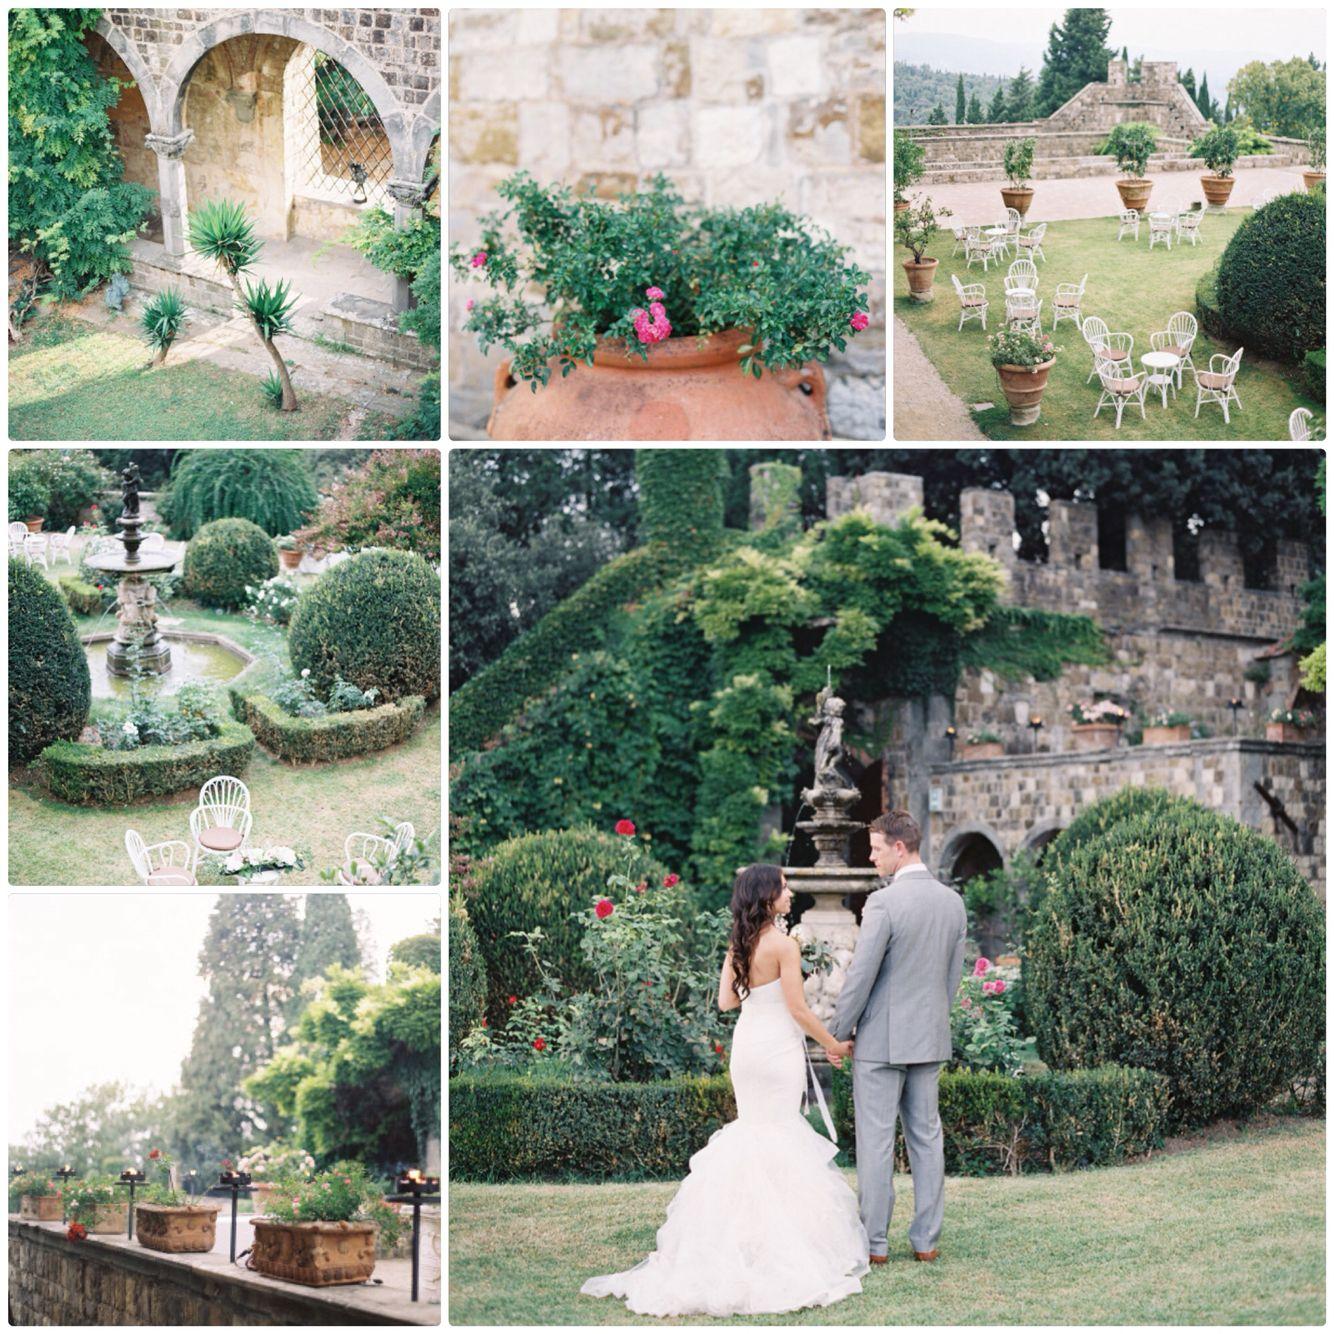 Castello Di Vincigliata, Florence Italy Wedding. Beautiful 13th century stone castle located in the Tuscan hills